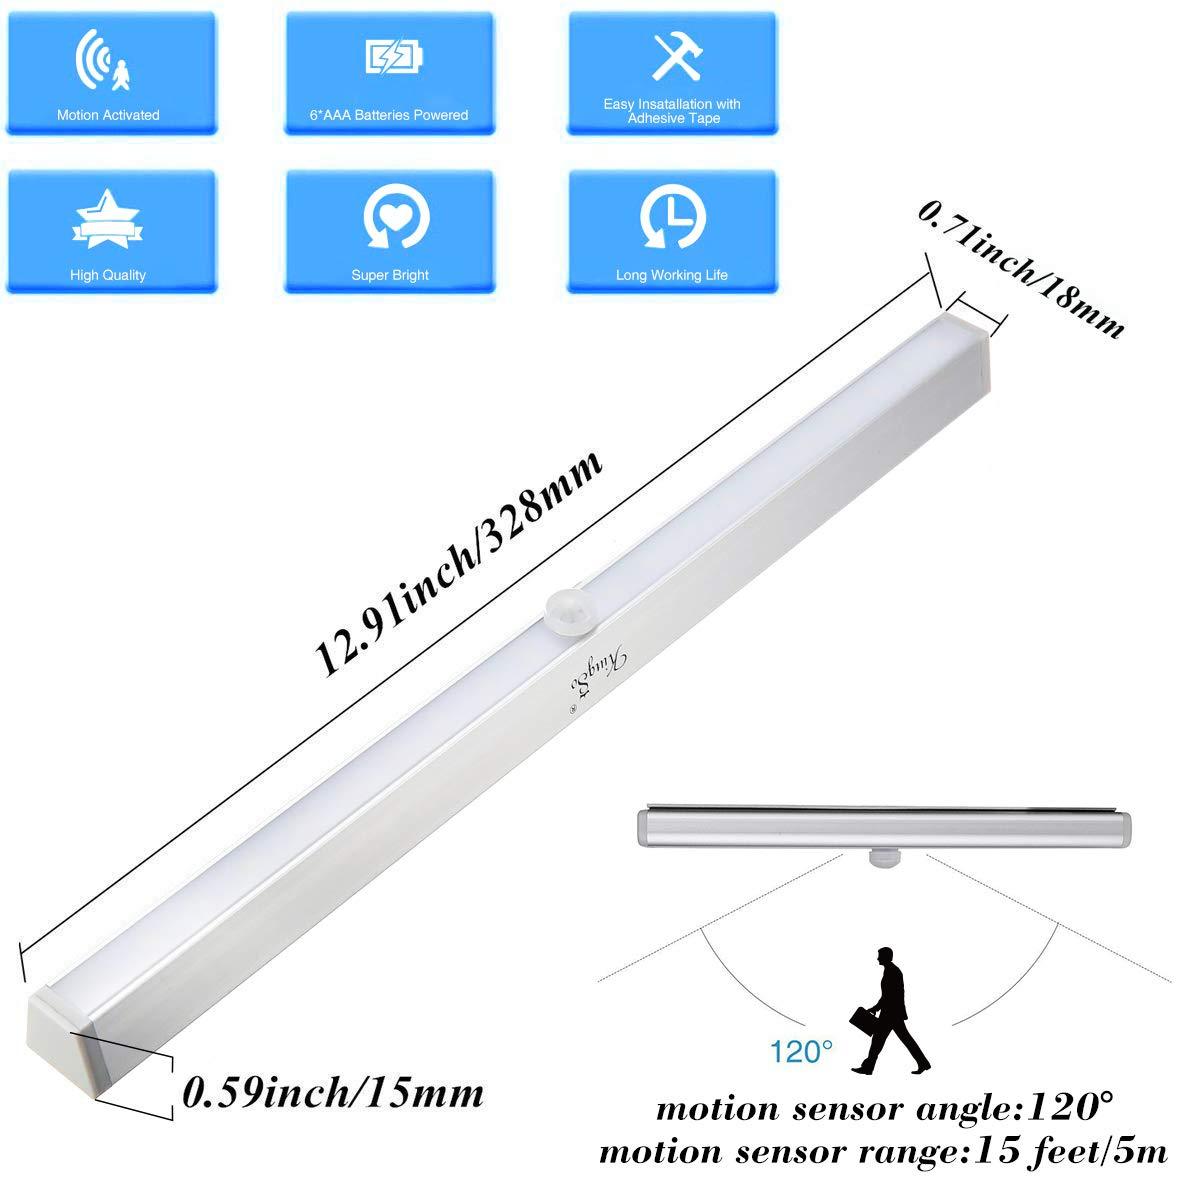 Lampara 2 pack LED del Armario, KINGSO 20 LEDs Barra de Luz Inalš¢mbrica con Sensor de Movimiento, Operada por 8 AAA Bateršªas: Amazon.es: Iluminación